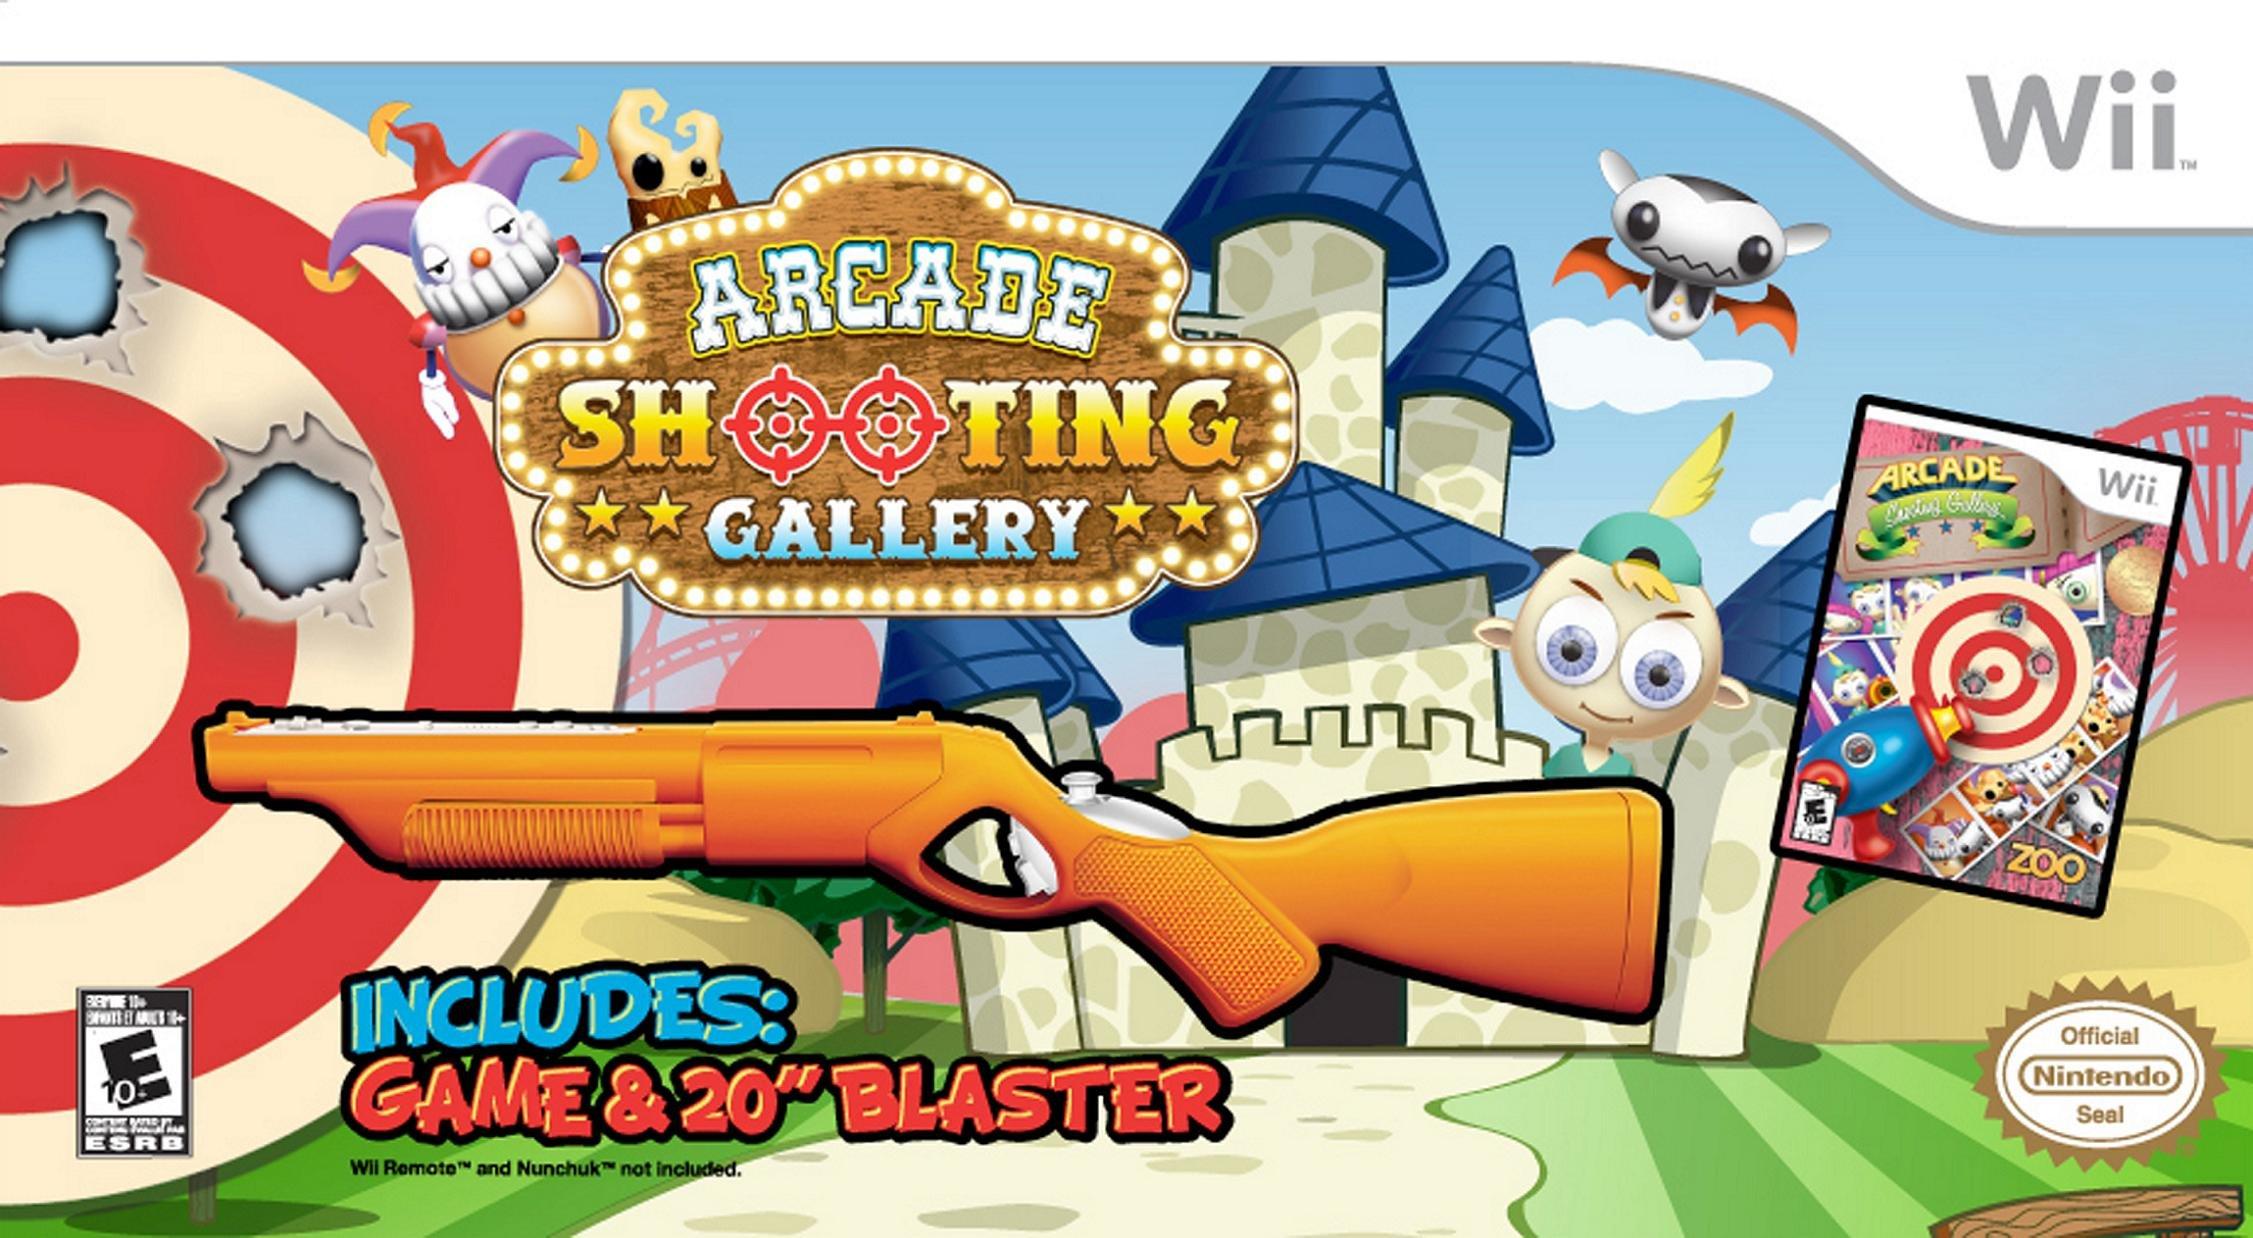 Arcade Shooting Gallery with Blaster - Nintendo Wii (Bundle)